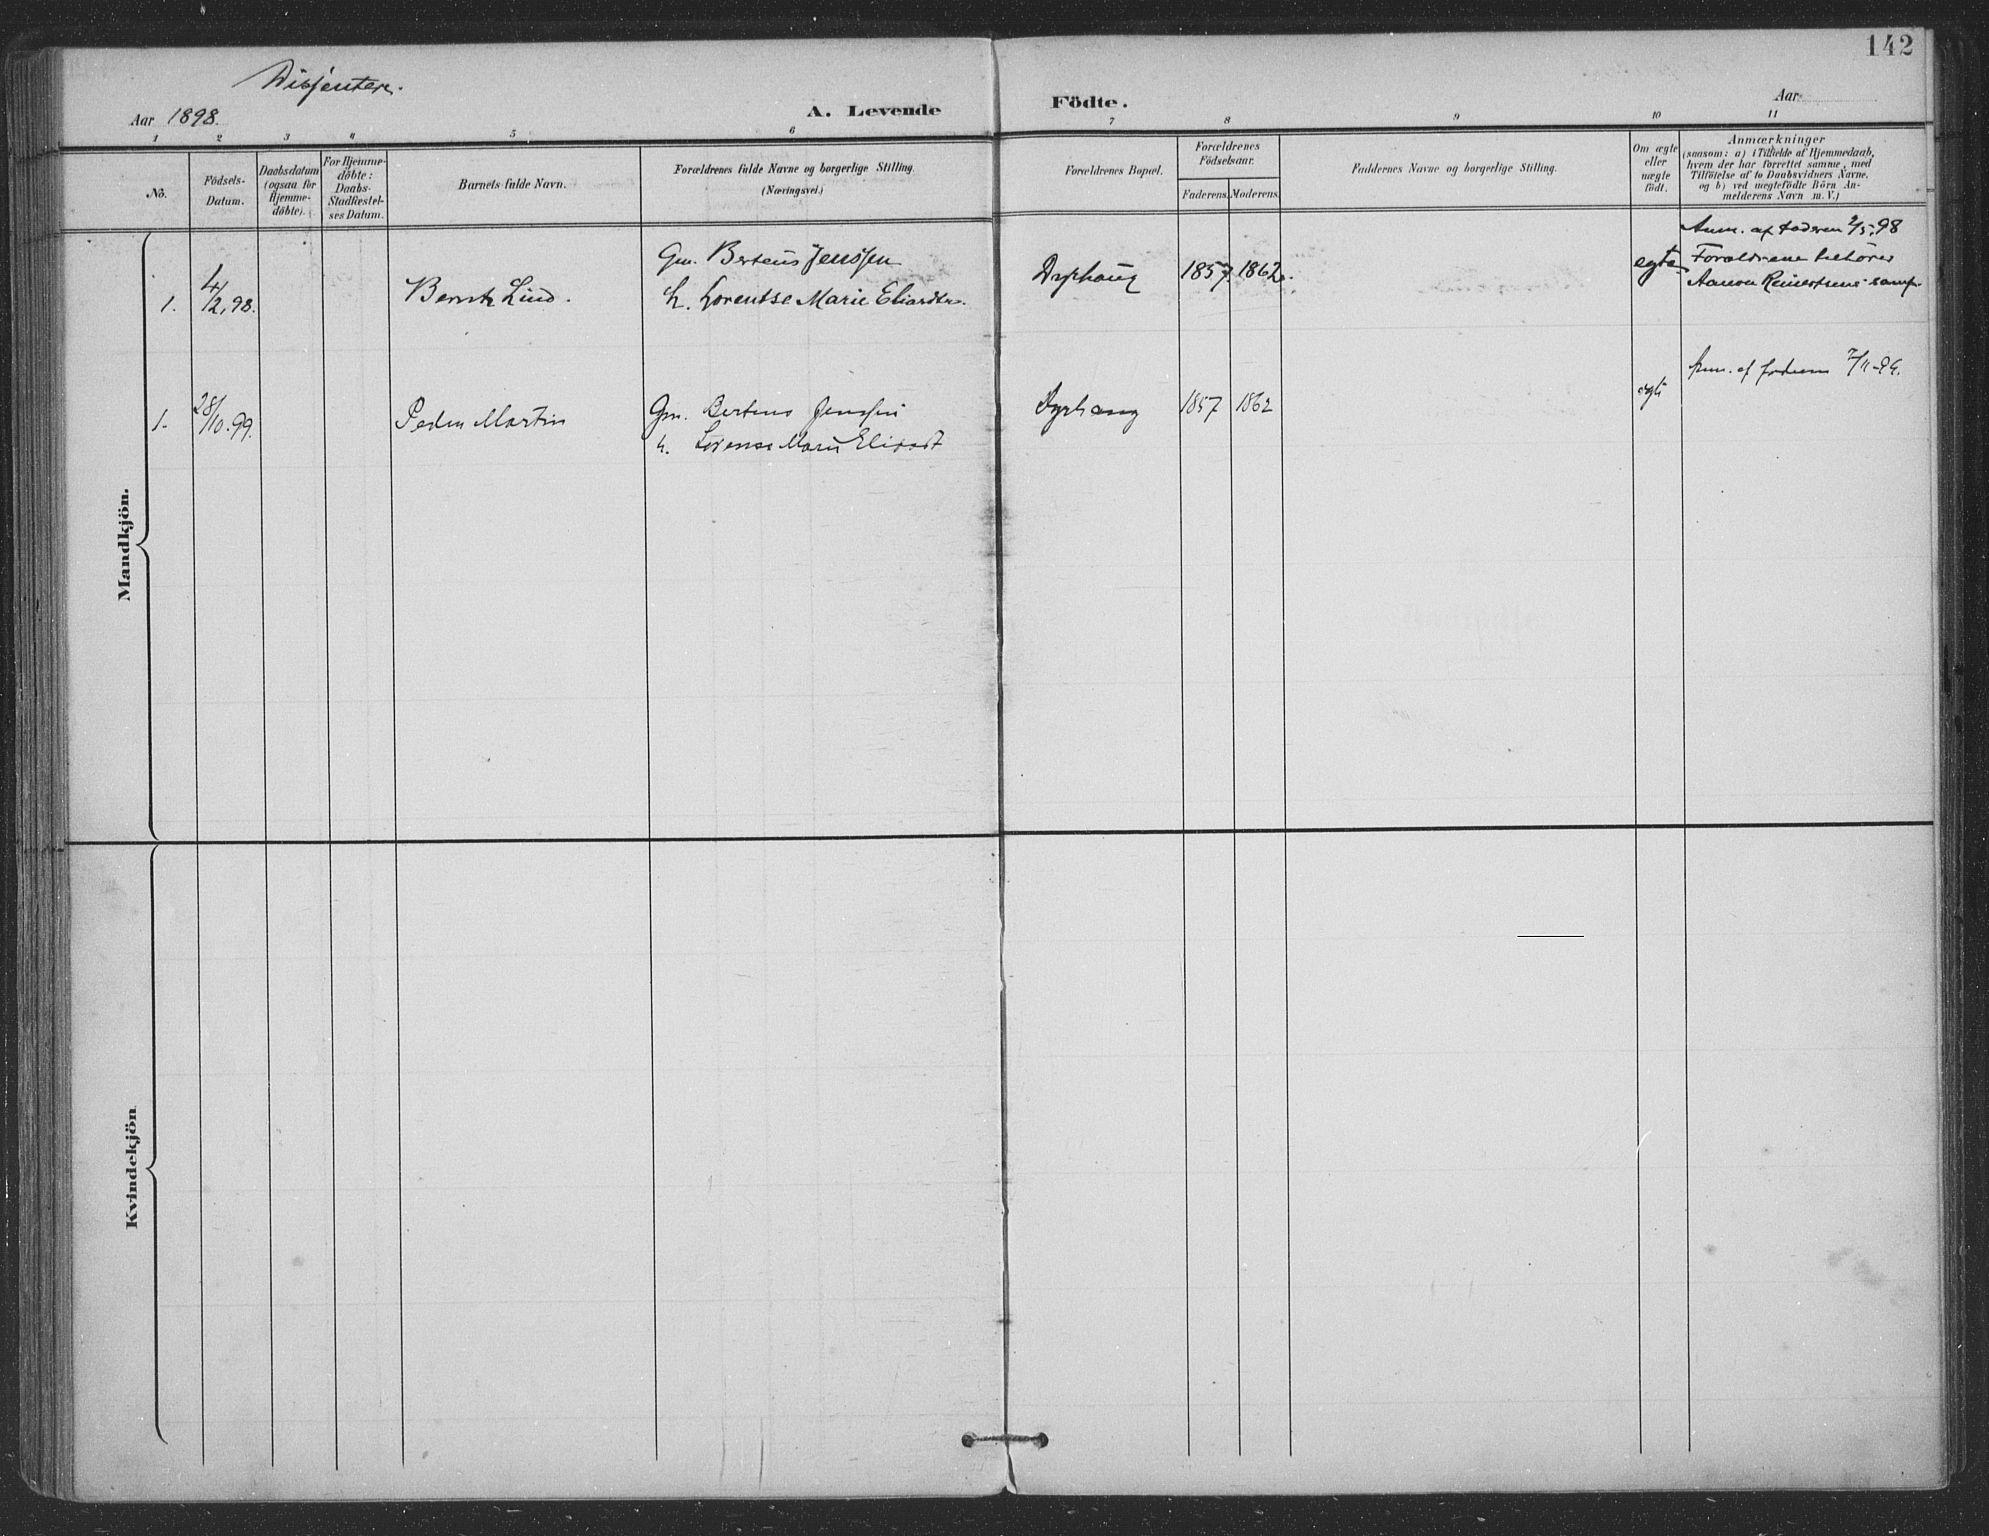 SAT, Ministerialprotokoller, klokkerbøker og fødselsregistre - Nordland, 863/L0899: Ministerialbok nr. 863A11, 1897-1906, s. 142